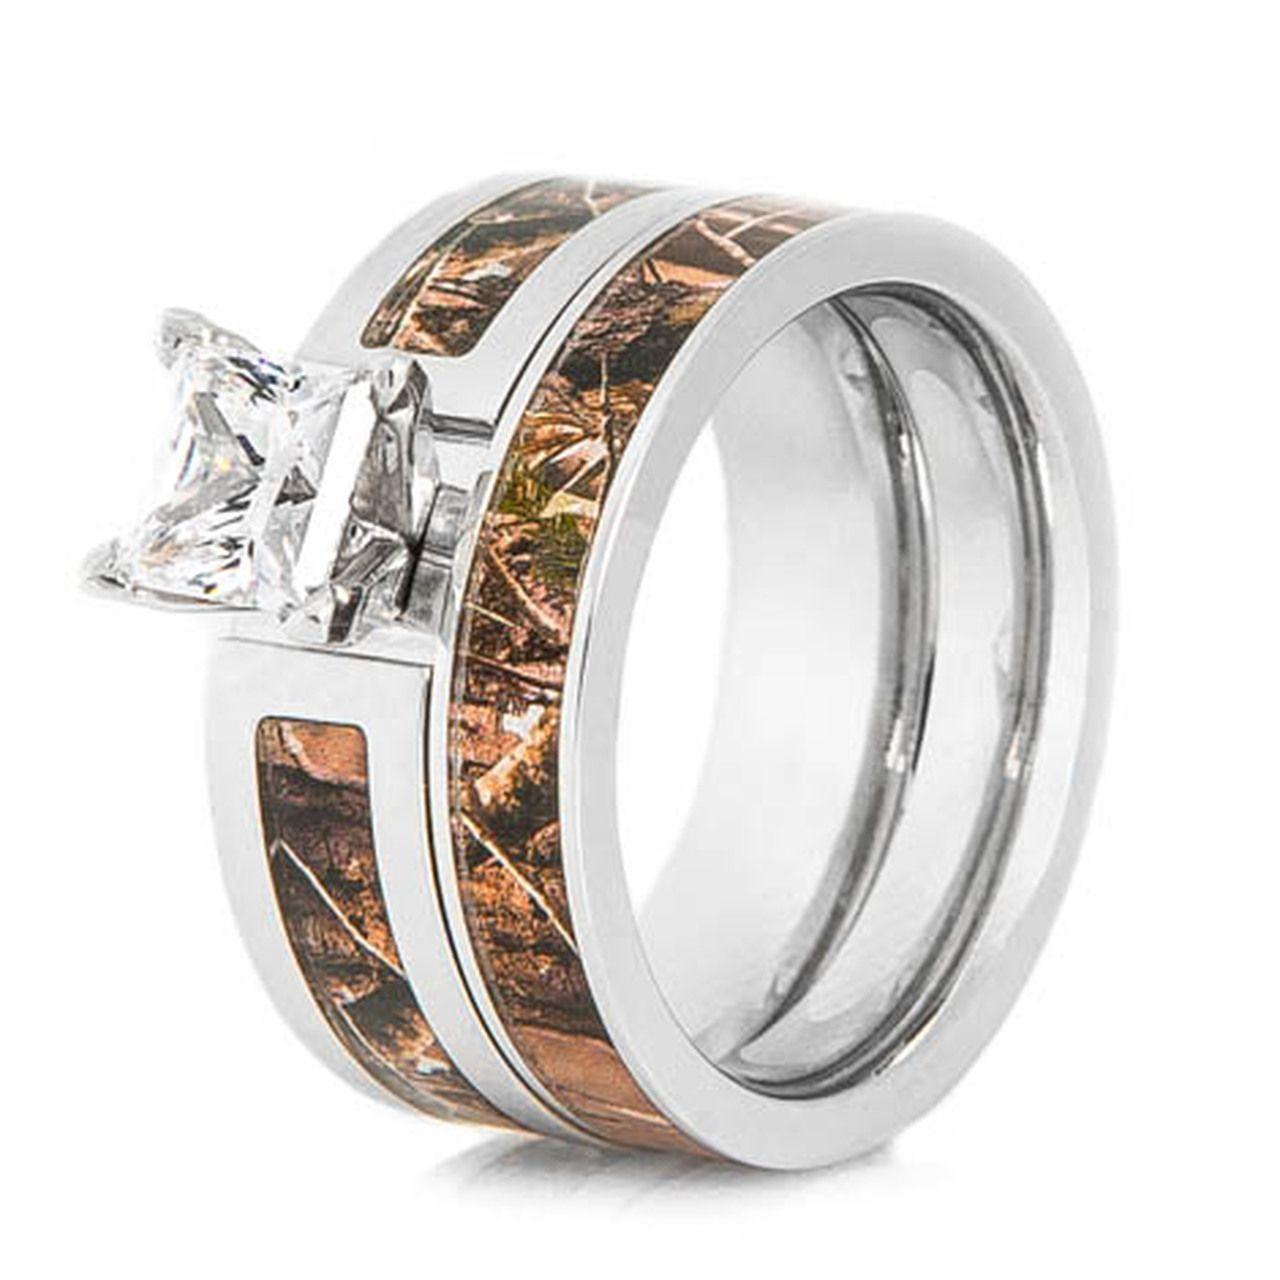 Women's Cobalt Chrome Realtree® Camo Wedding Ring Set in